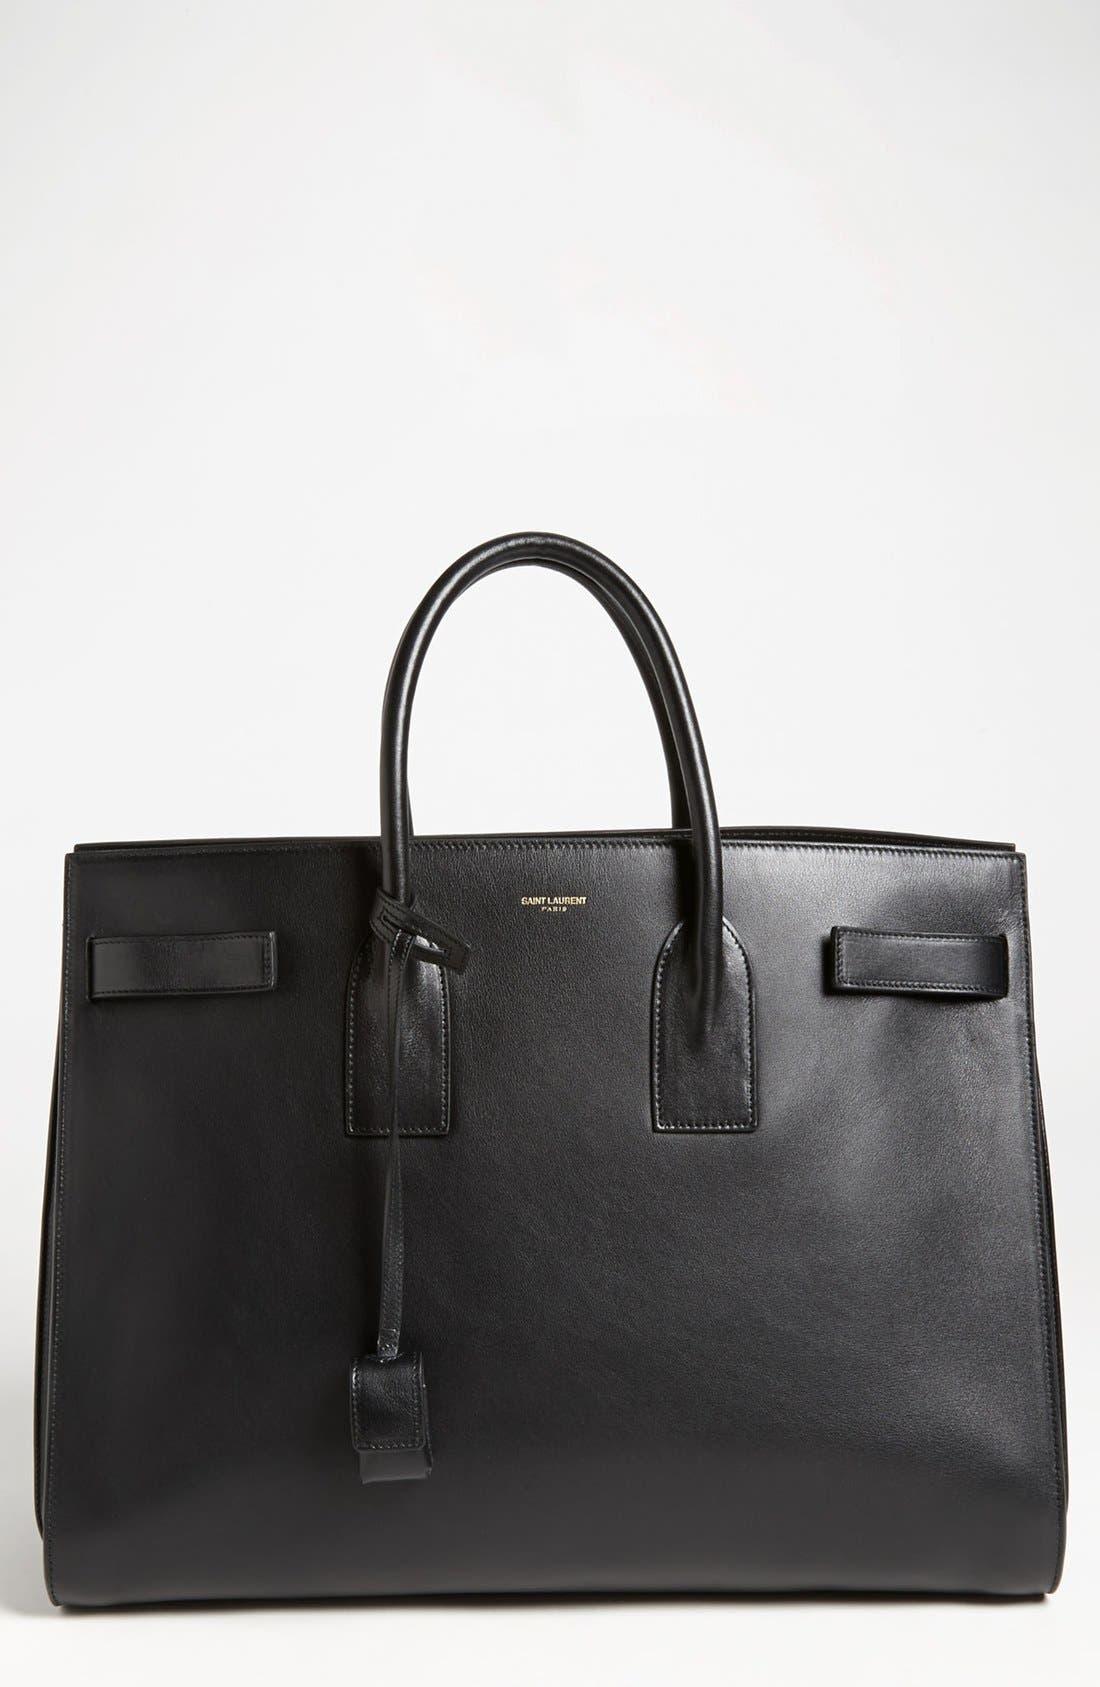 Alternate Image 1 Selected - Saint Laurent 'Sac de Jour' Leather Tote